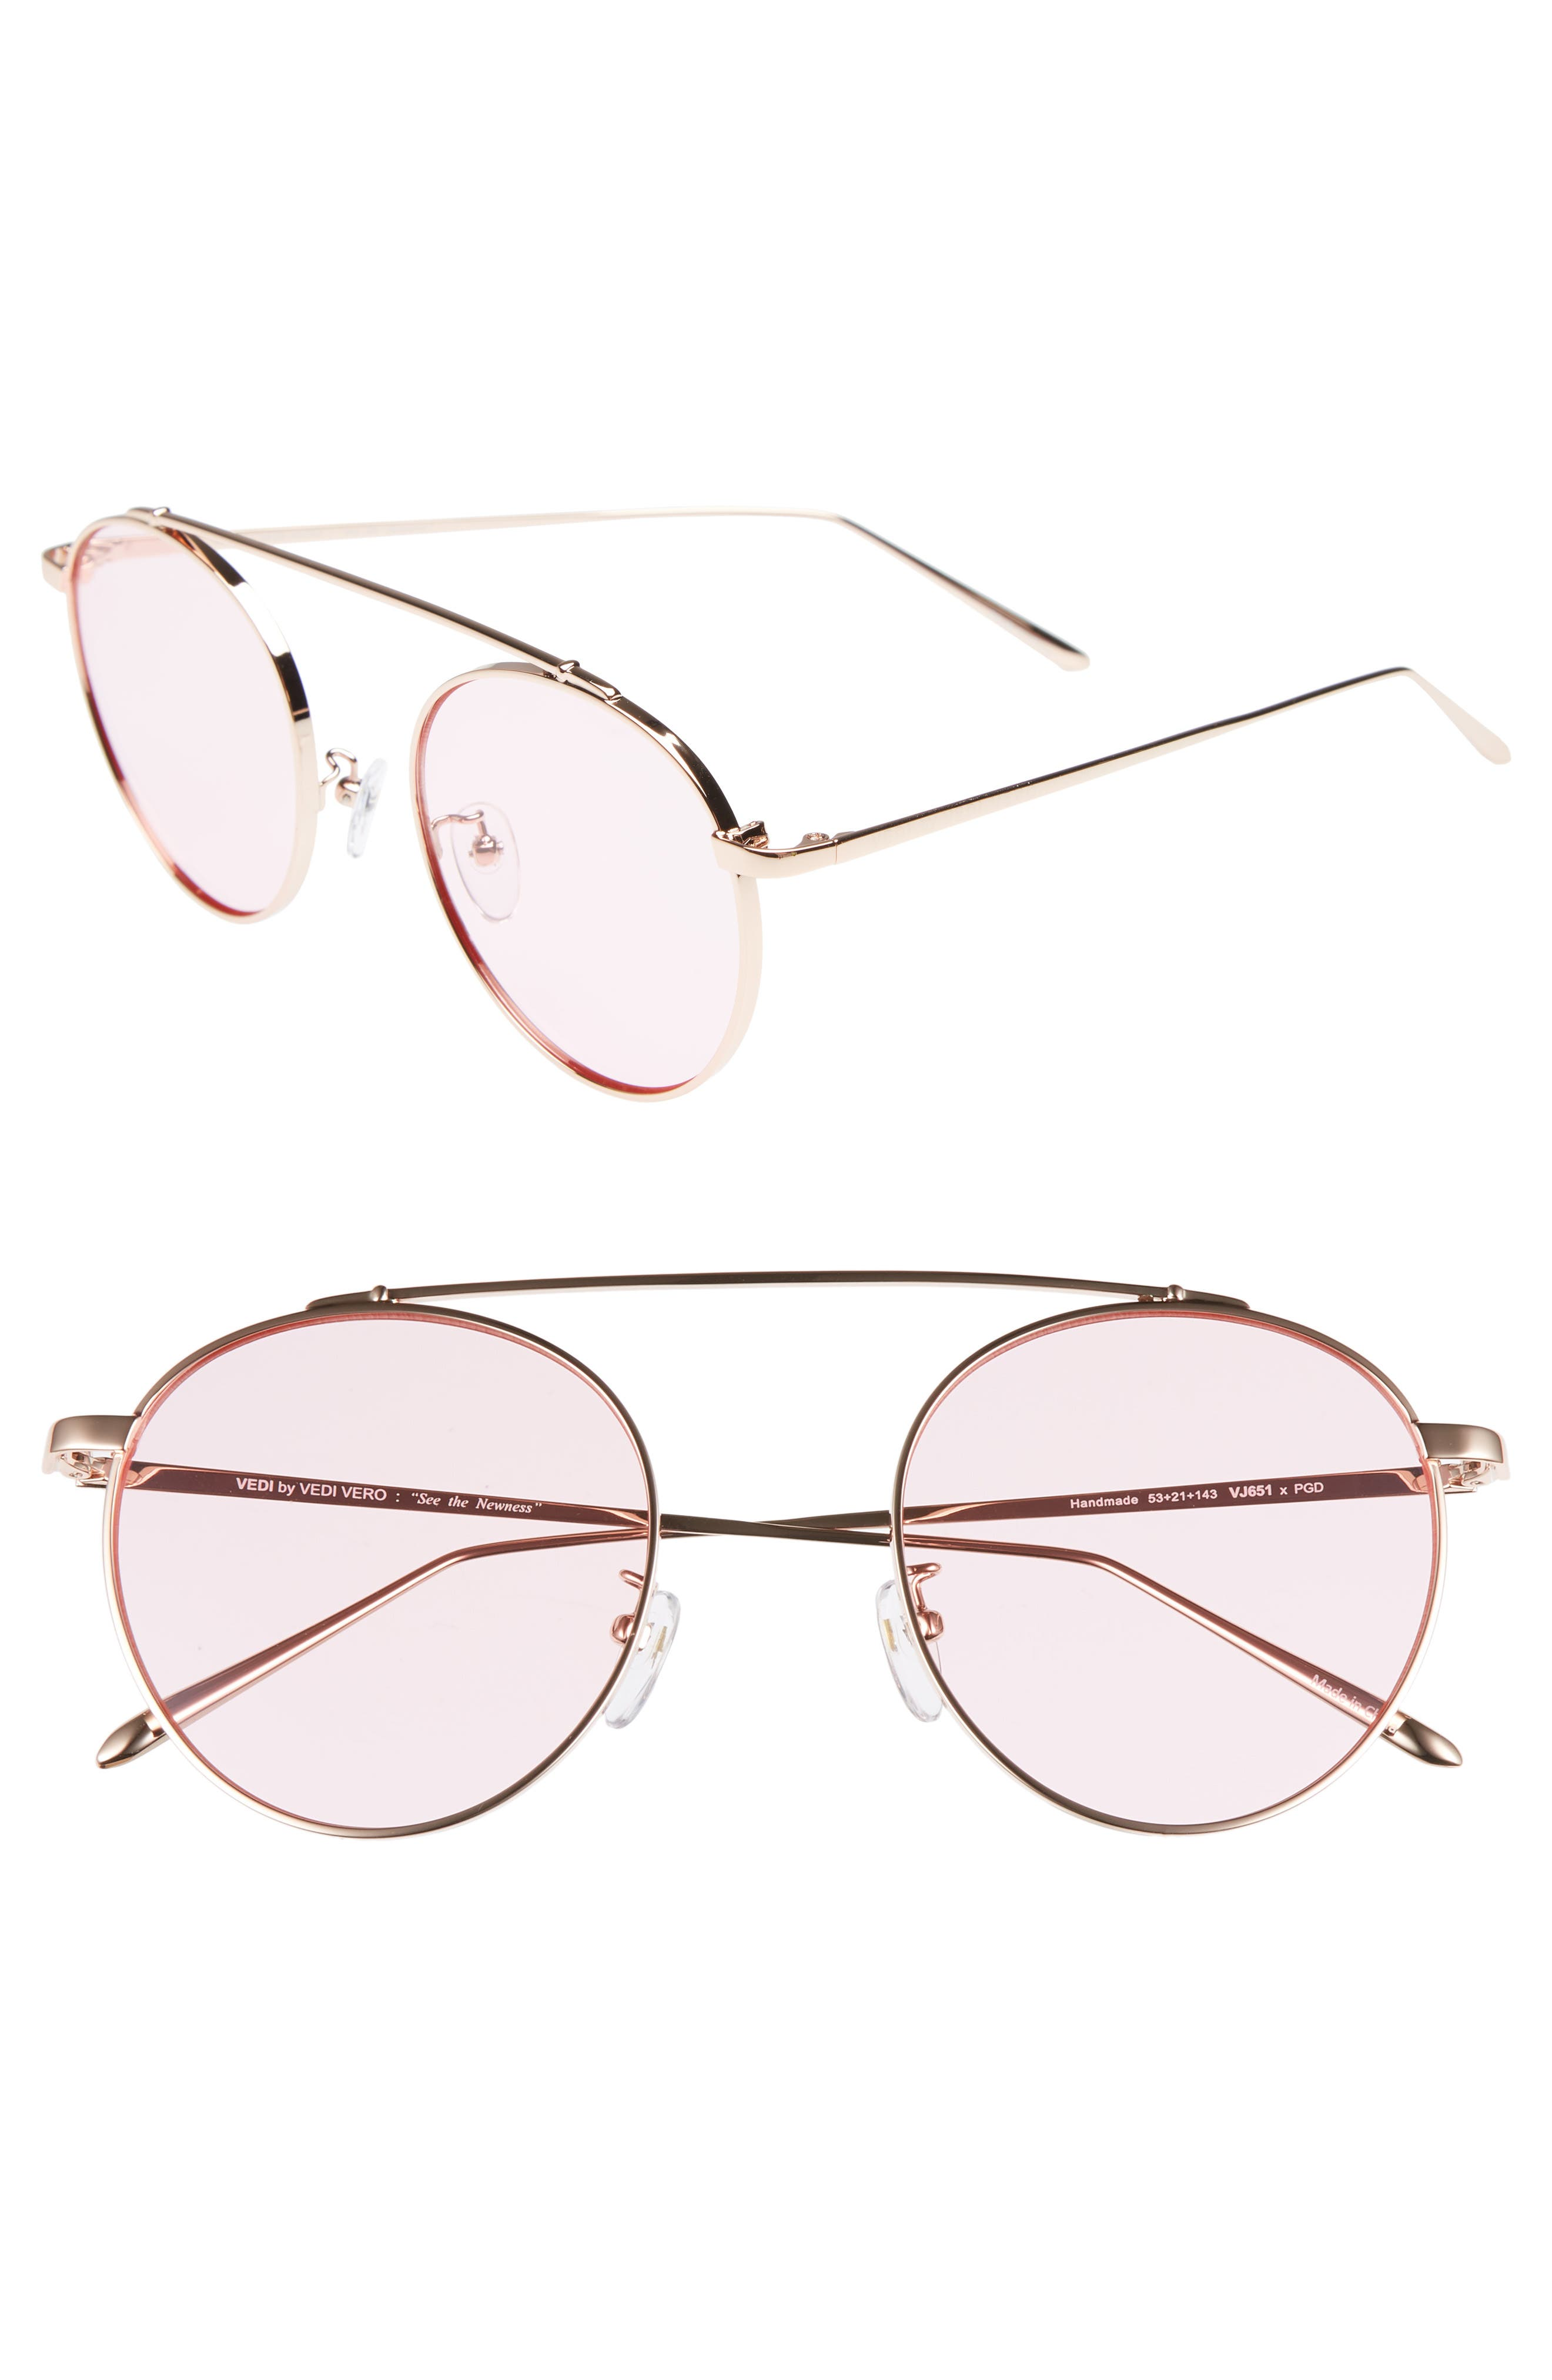 VEDI VERO,                             53mm Round Sunglasses,                             Main thumbnail 1, color,                             ROSEGLD/PINK